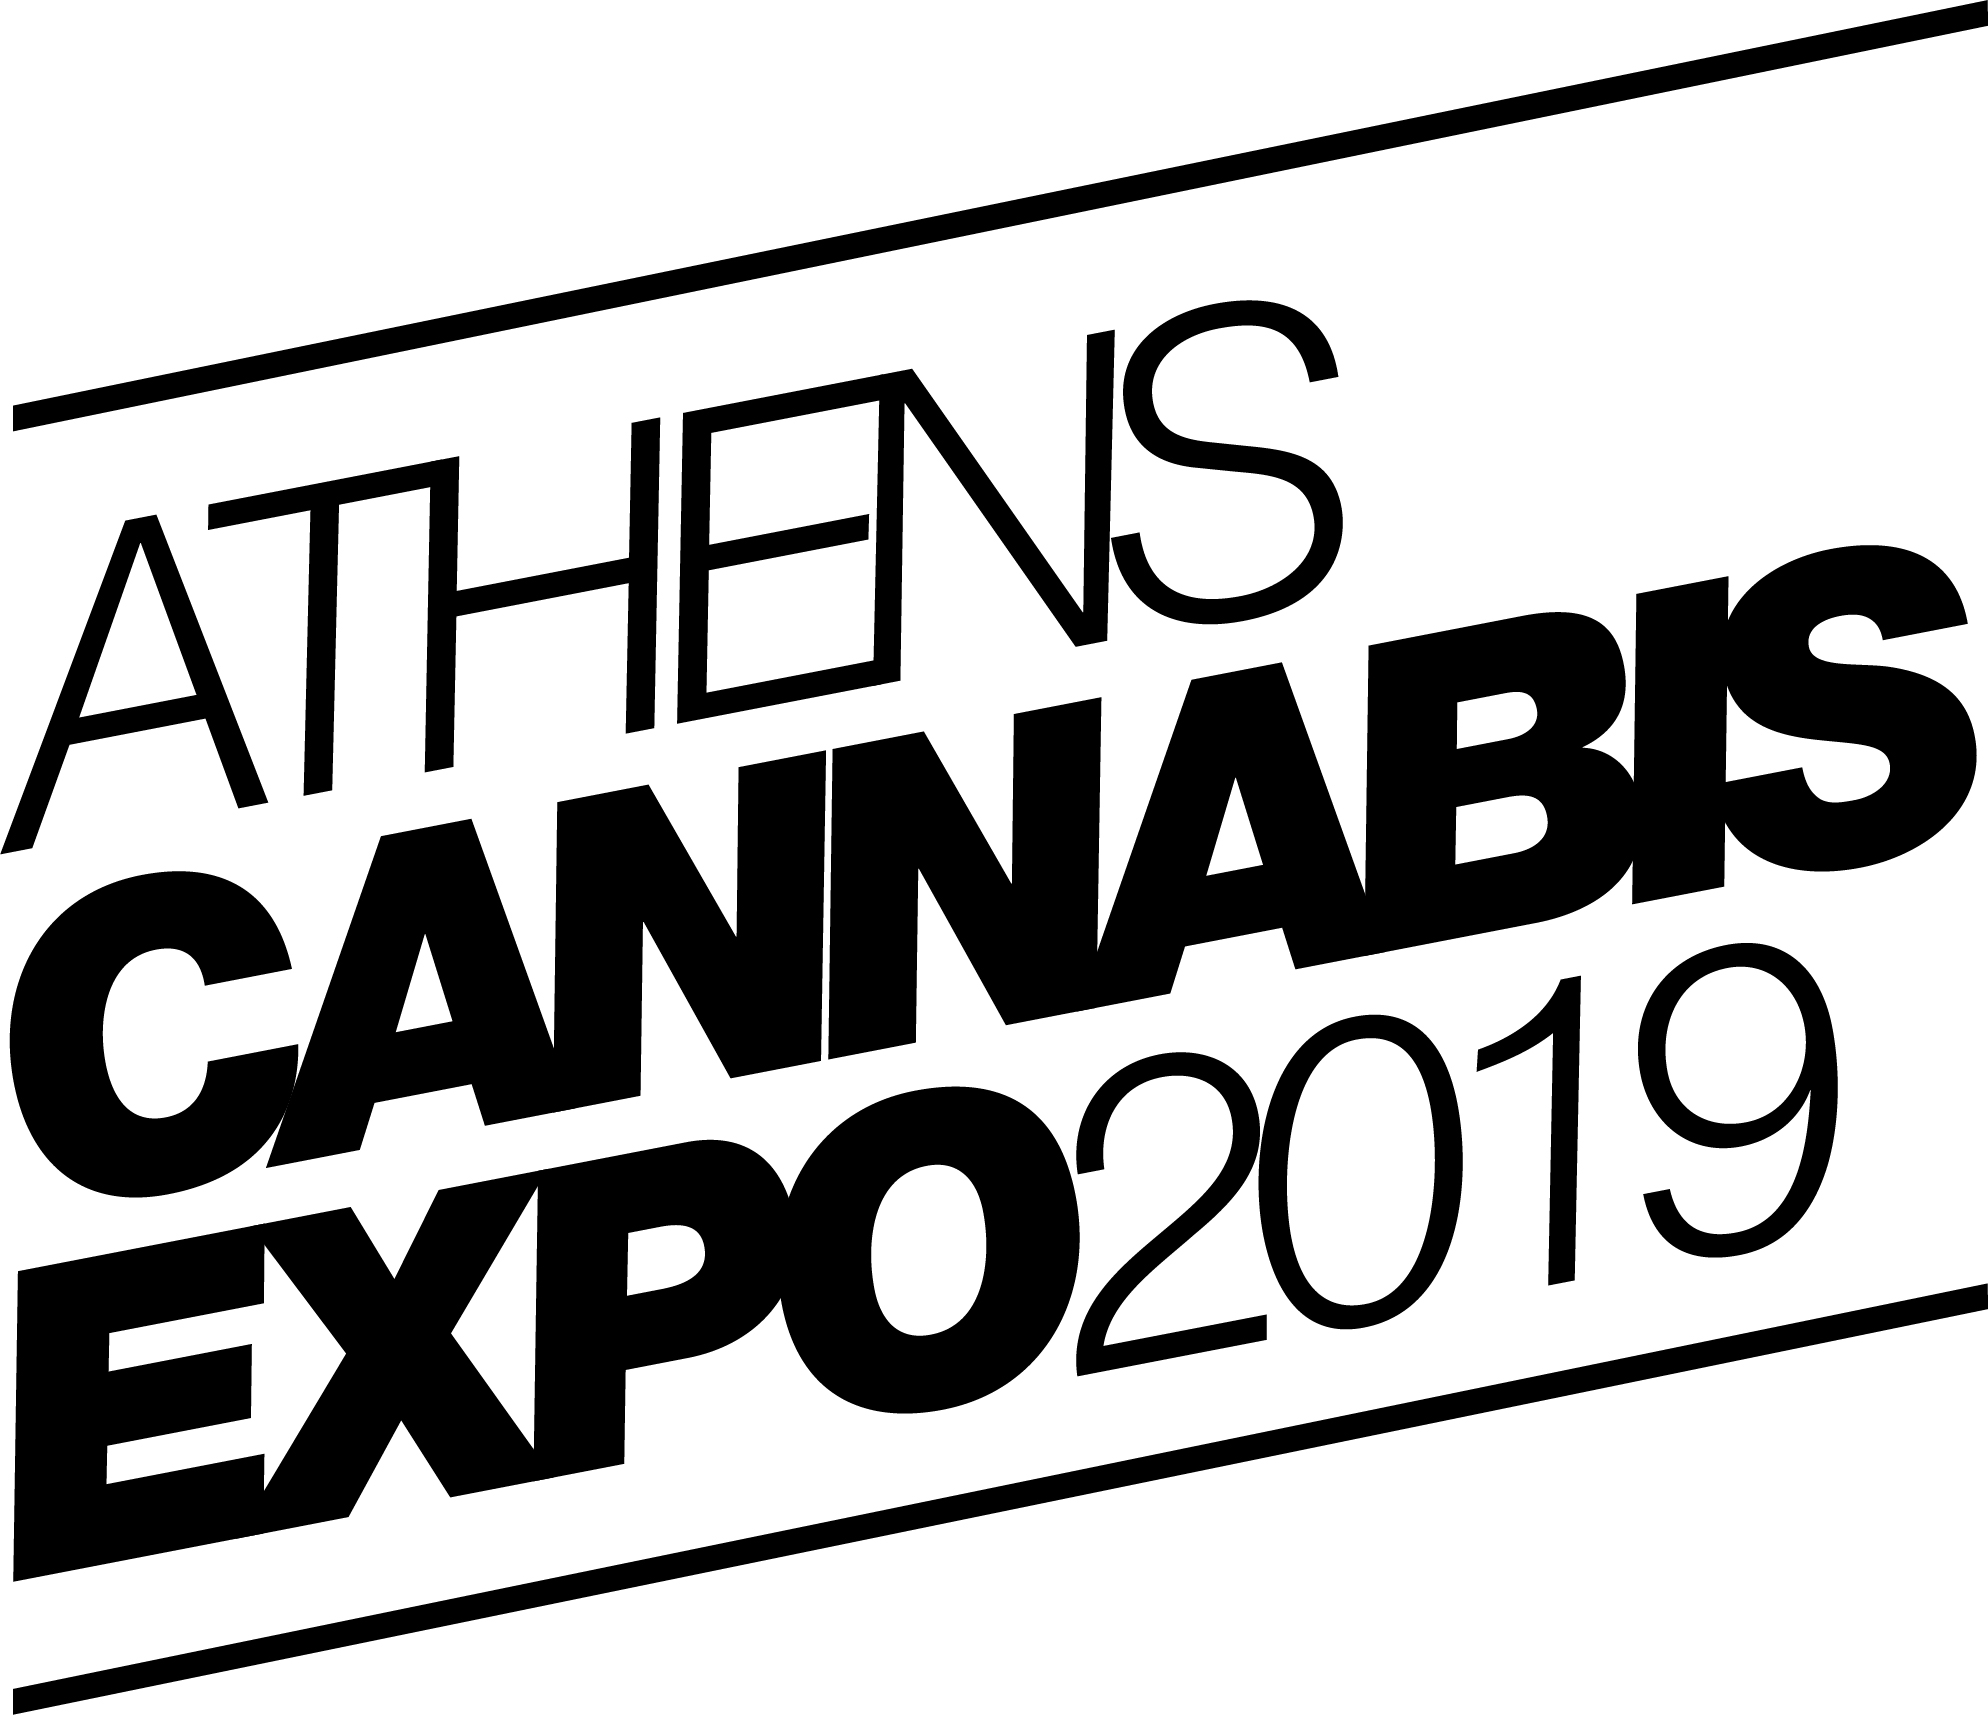 Athens Cannabis Expo 2018 | Διεθνής Έκθεση Κάνναβης 2018